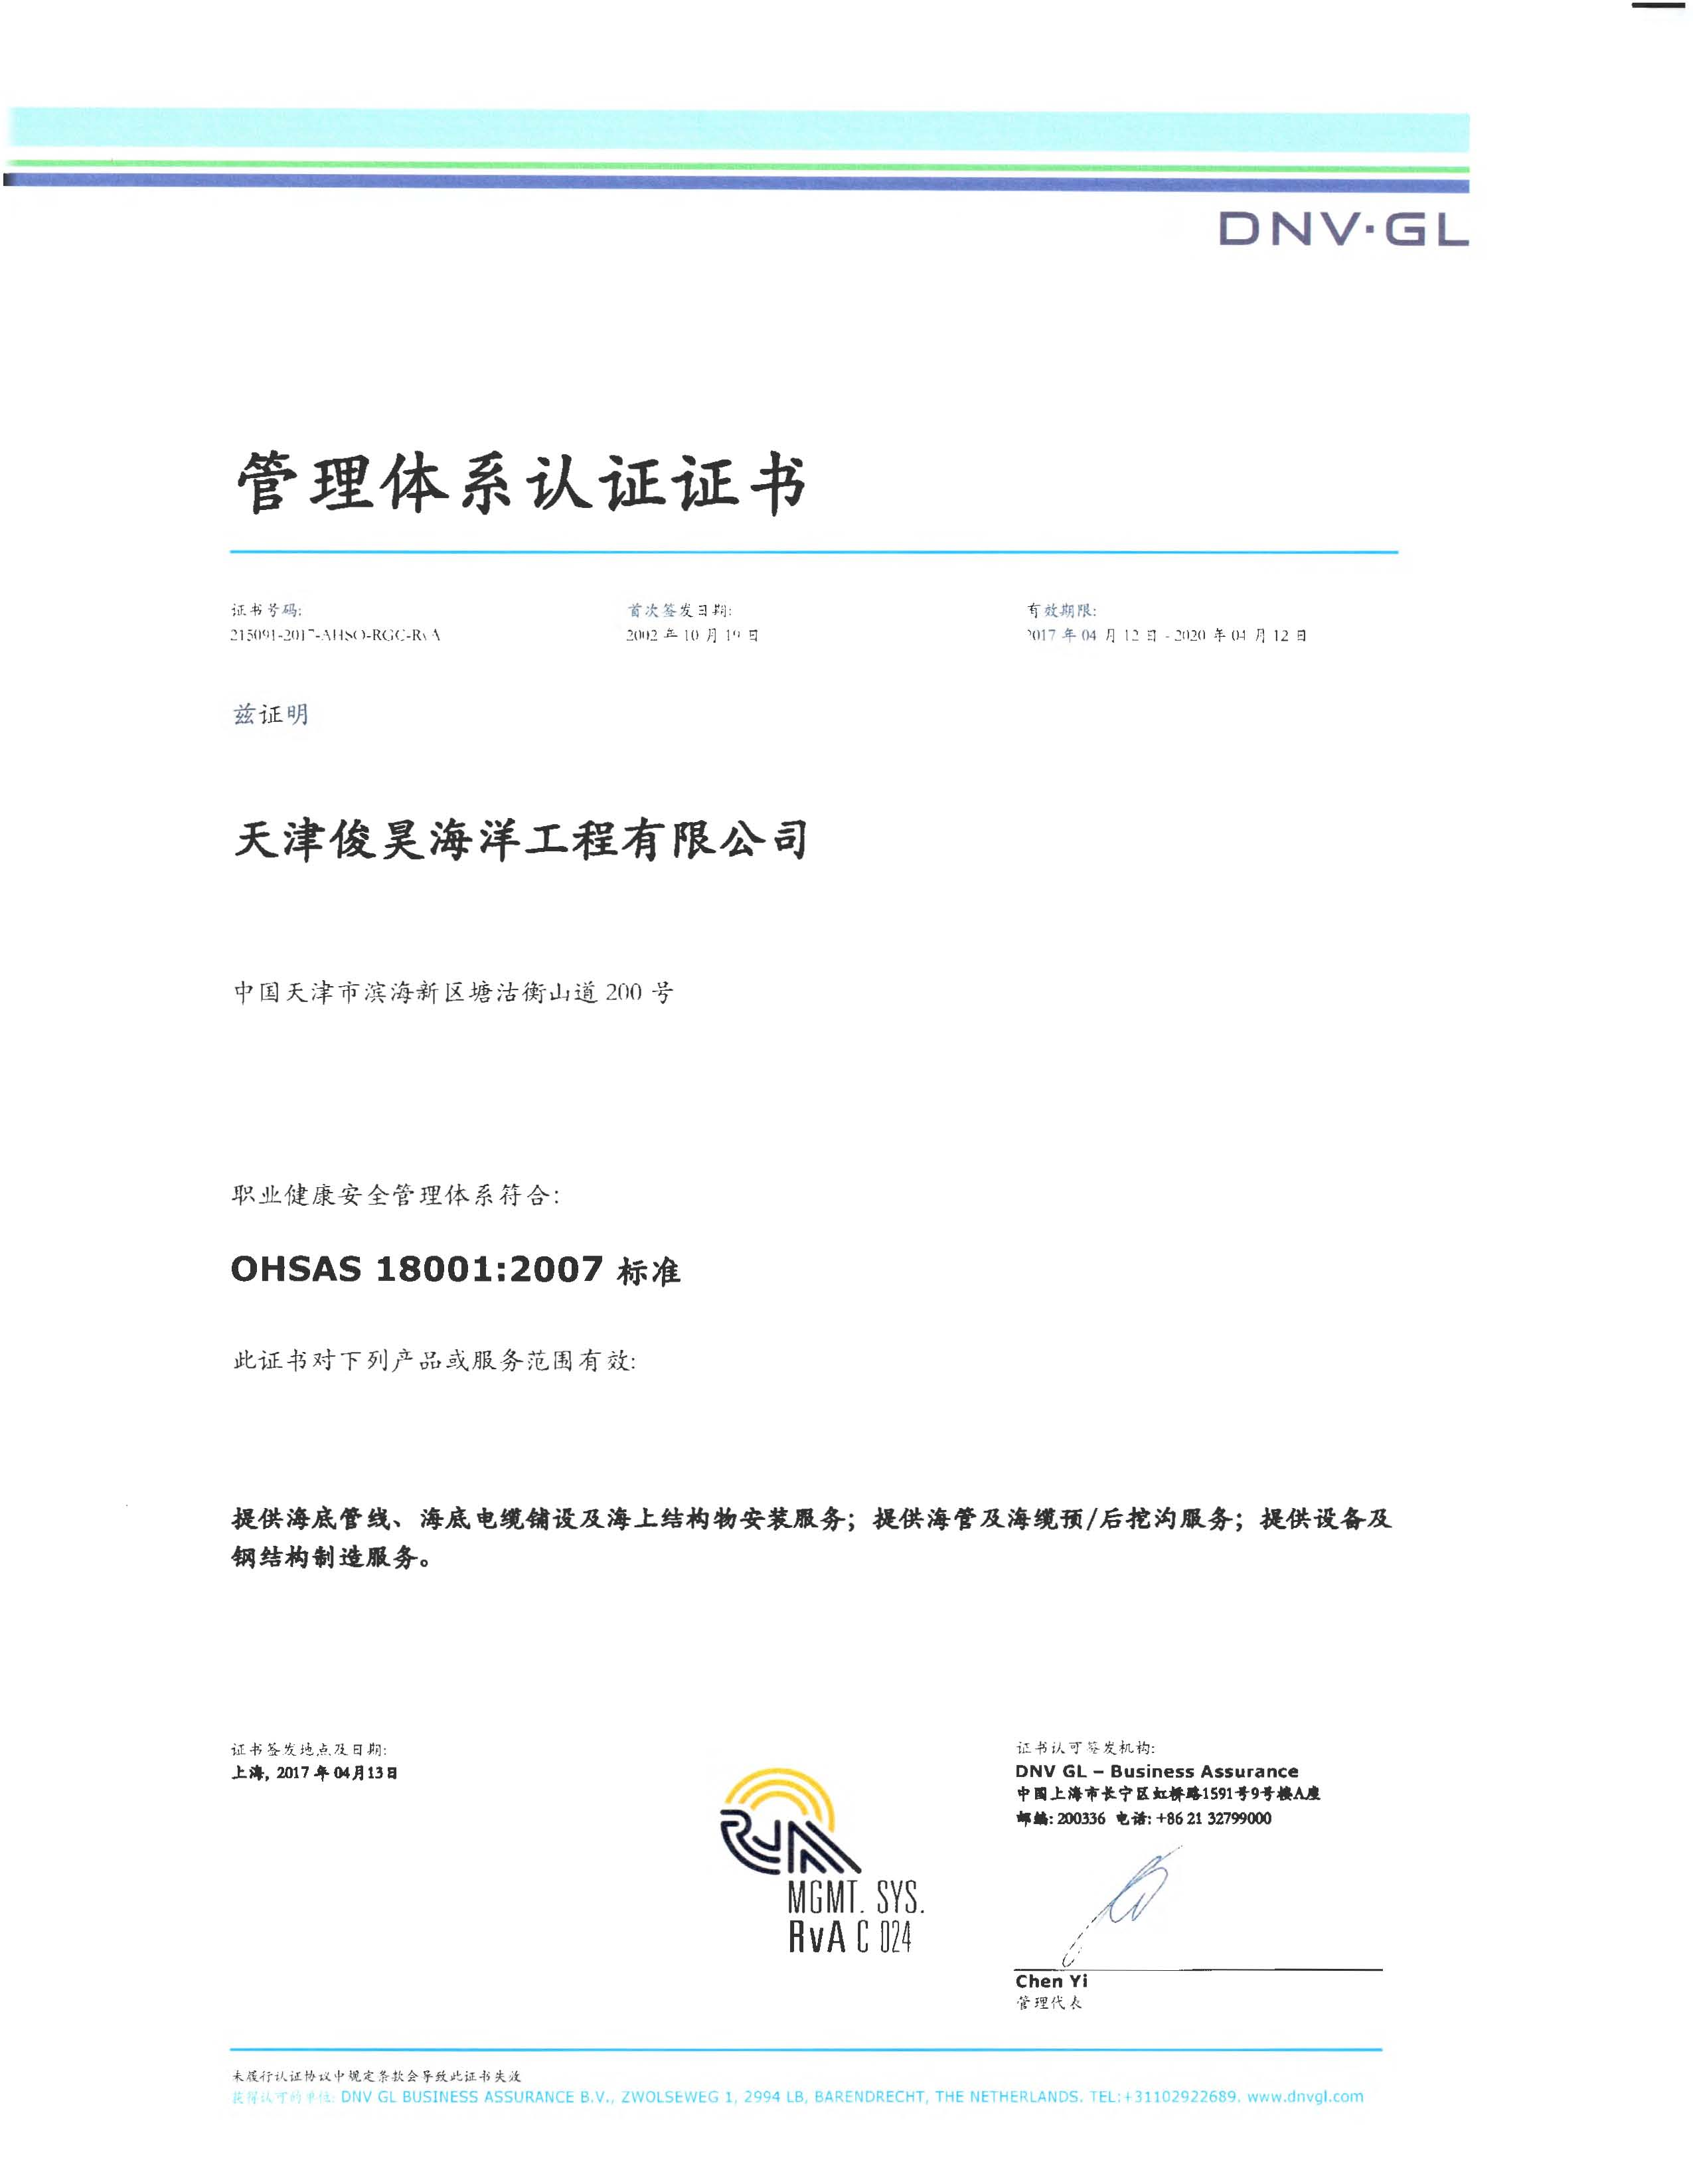 OHSAS18001:2007职业健康安全管理体系认证证书